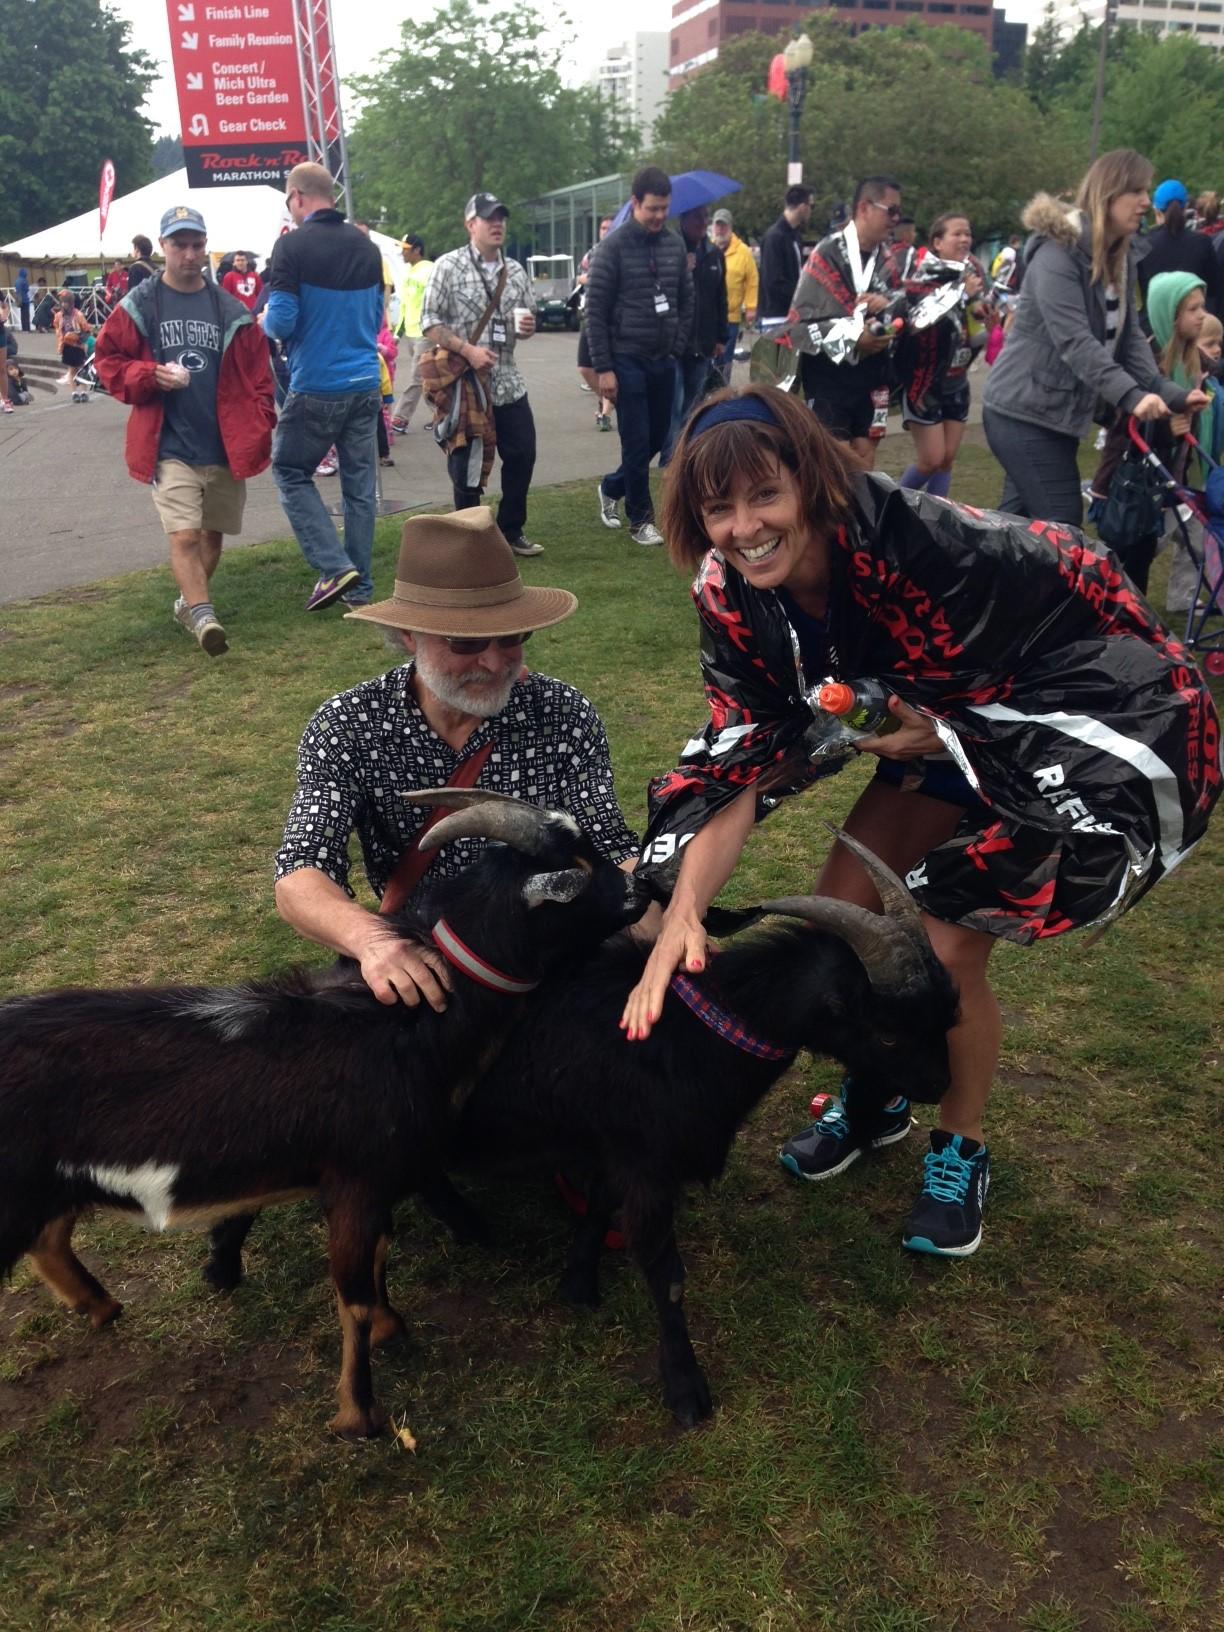 Portland goat scene